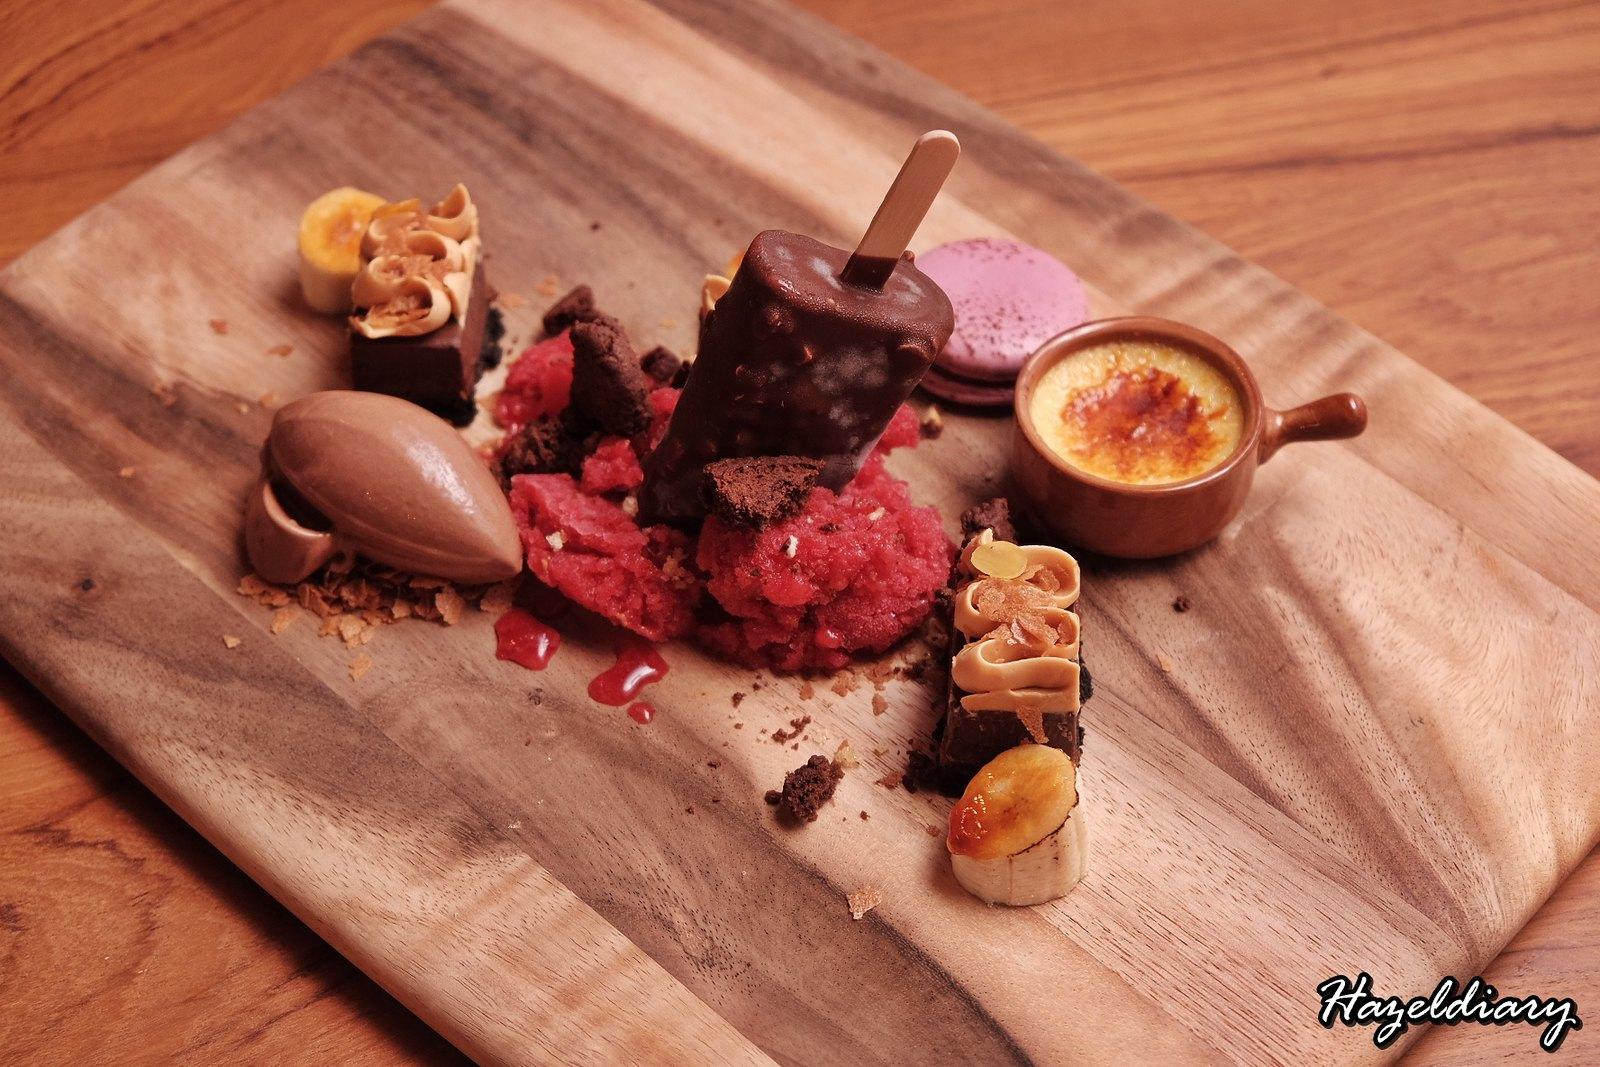 House of MU-Hazeldiary-Dessert Platter